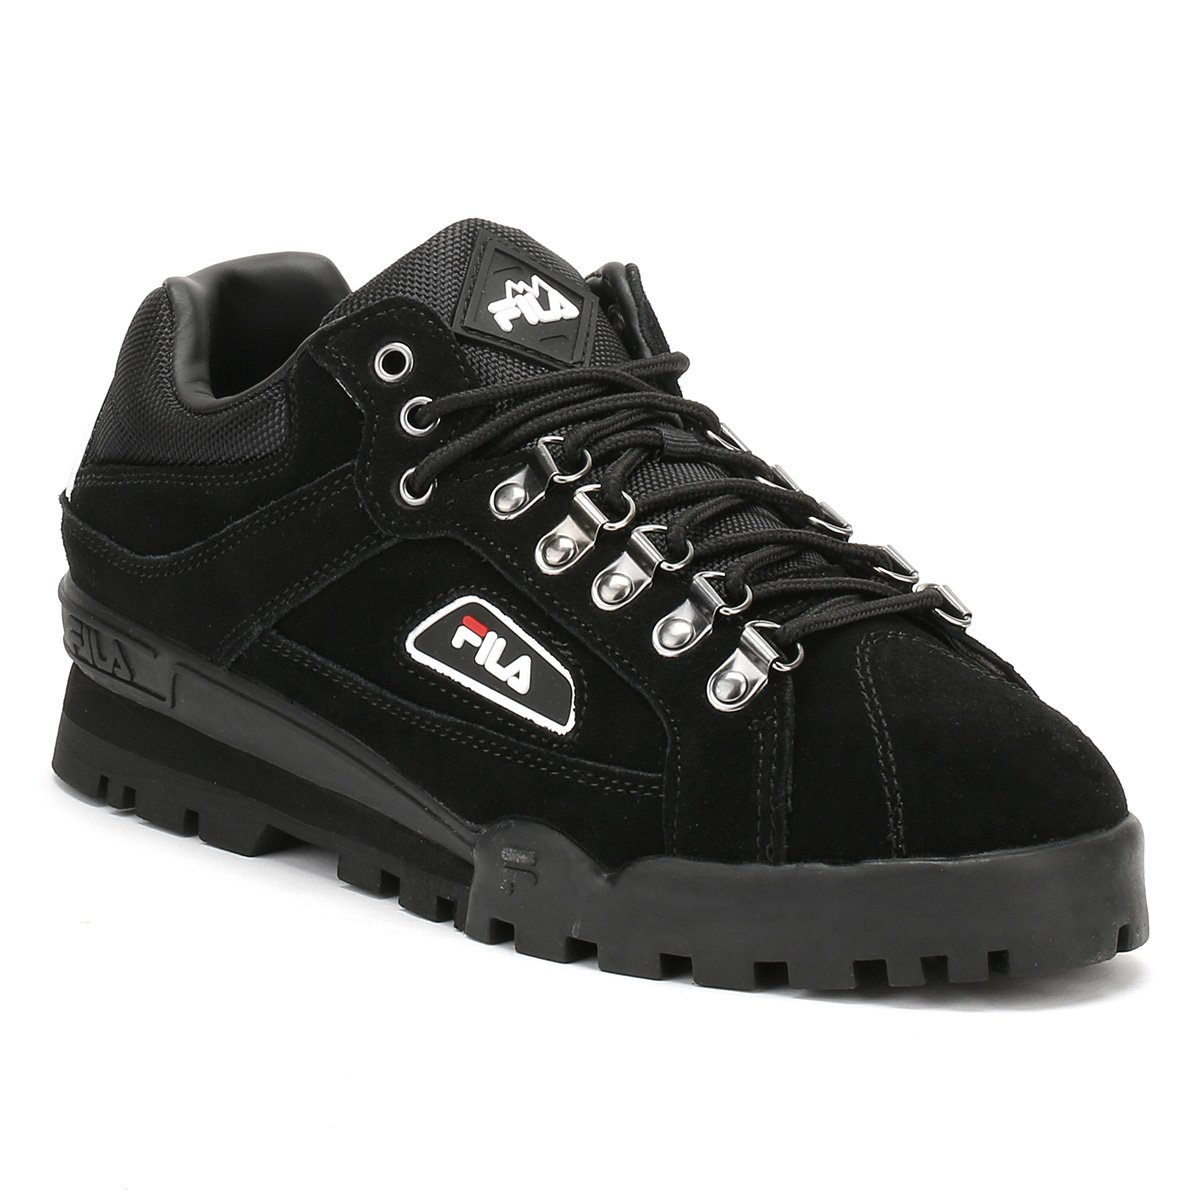 2f47eceb04d8 Fila Black White Trailblazer Trainers  Amazon.co.uk  Shoes   Bags